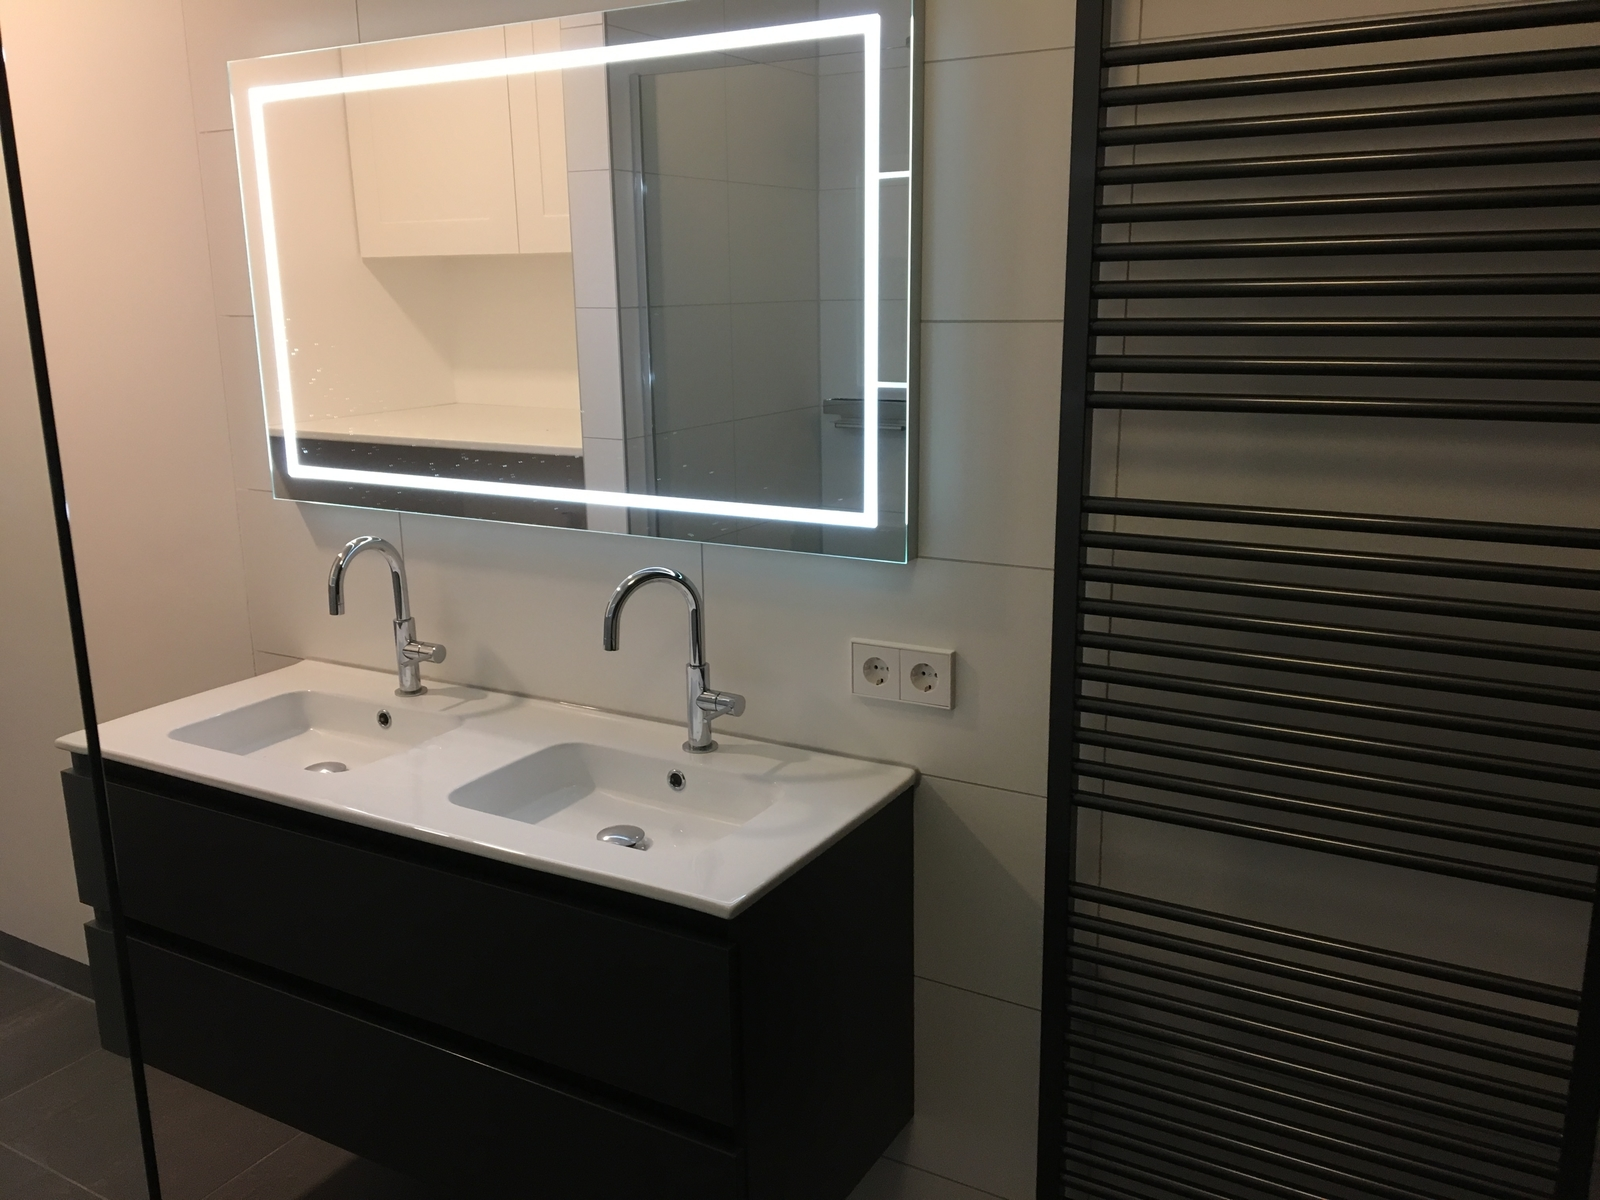 Betonlook badkamer toilet amsterdam tuijps tegels sanitair en keukens